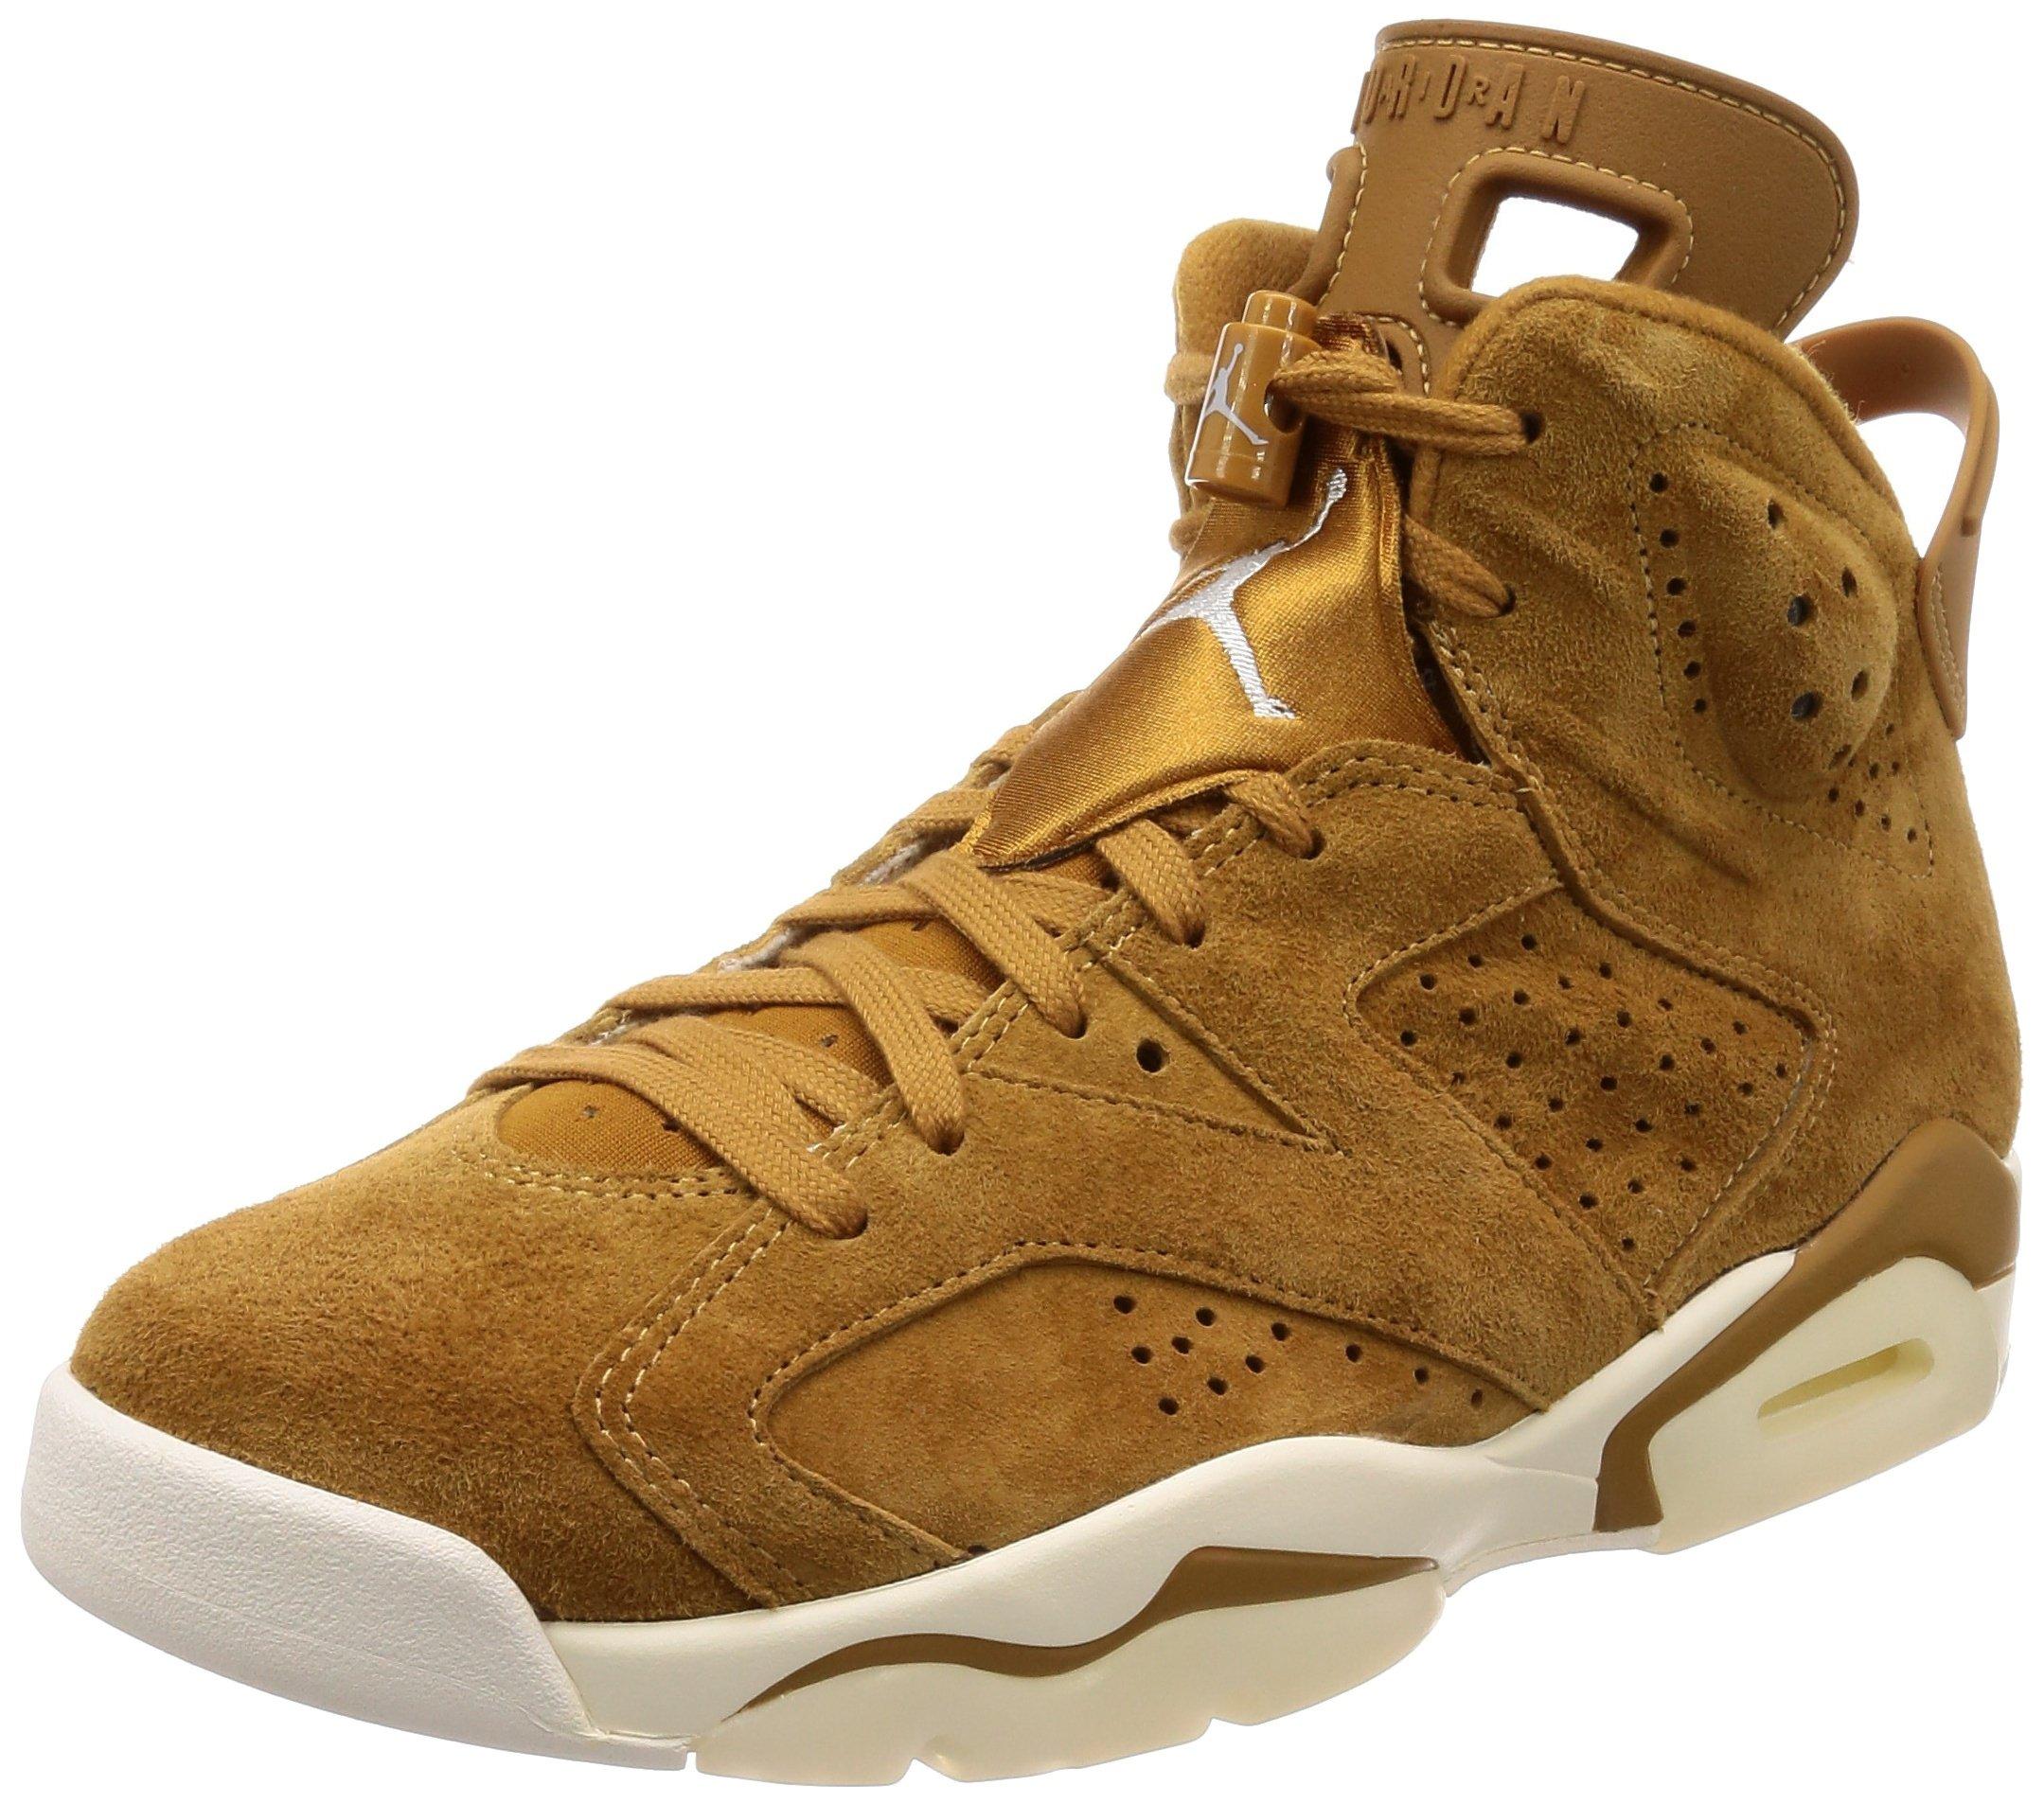 Jordan Retro 6 Men's Golden Harvest Wheat Basketball Shoe (10 D(M) US) by Jordan